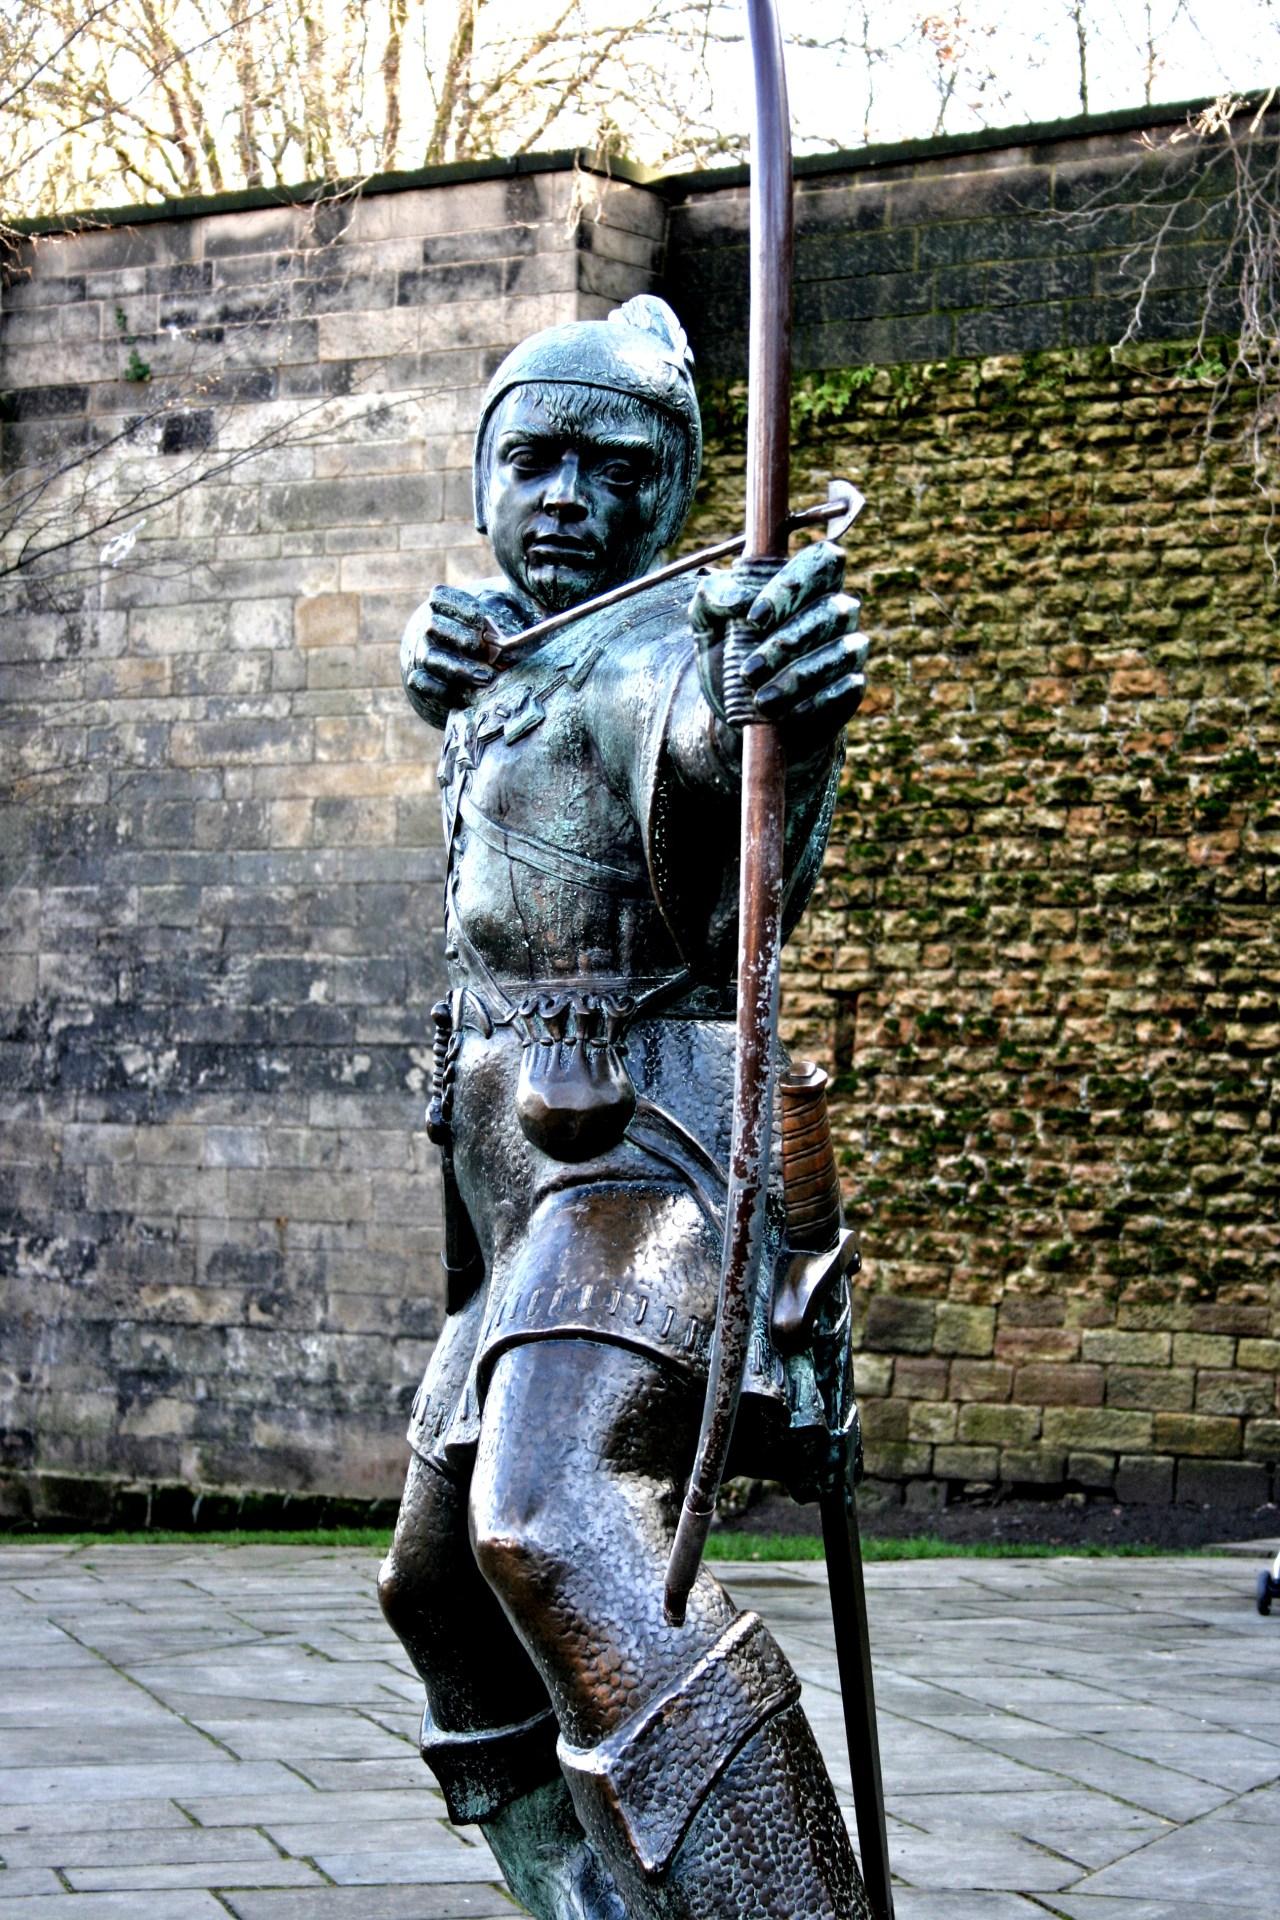 Robin Hood at Nottingham Castle